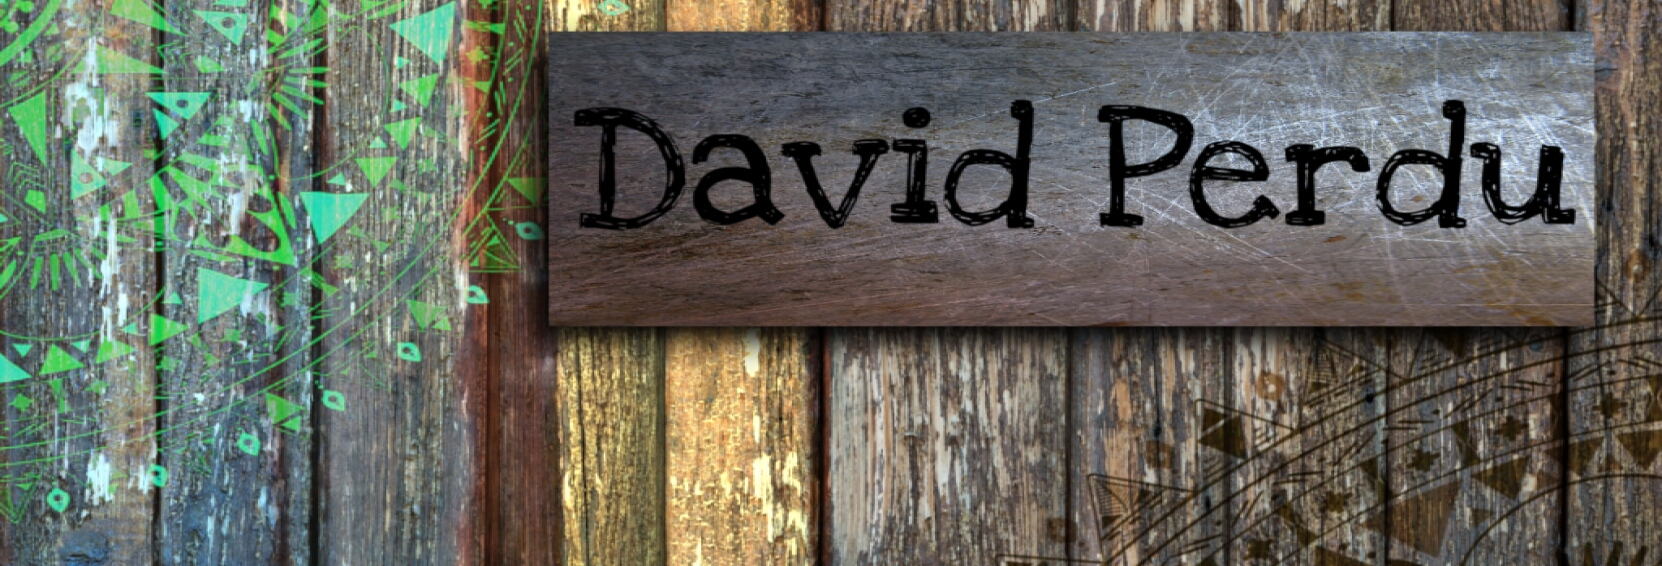 David Perdu